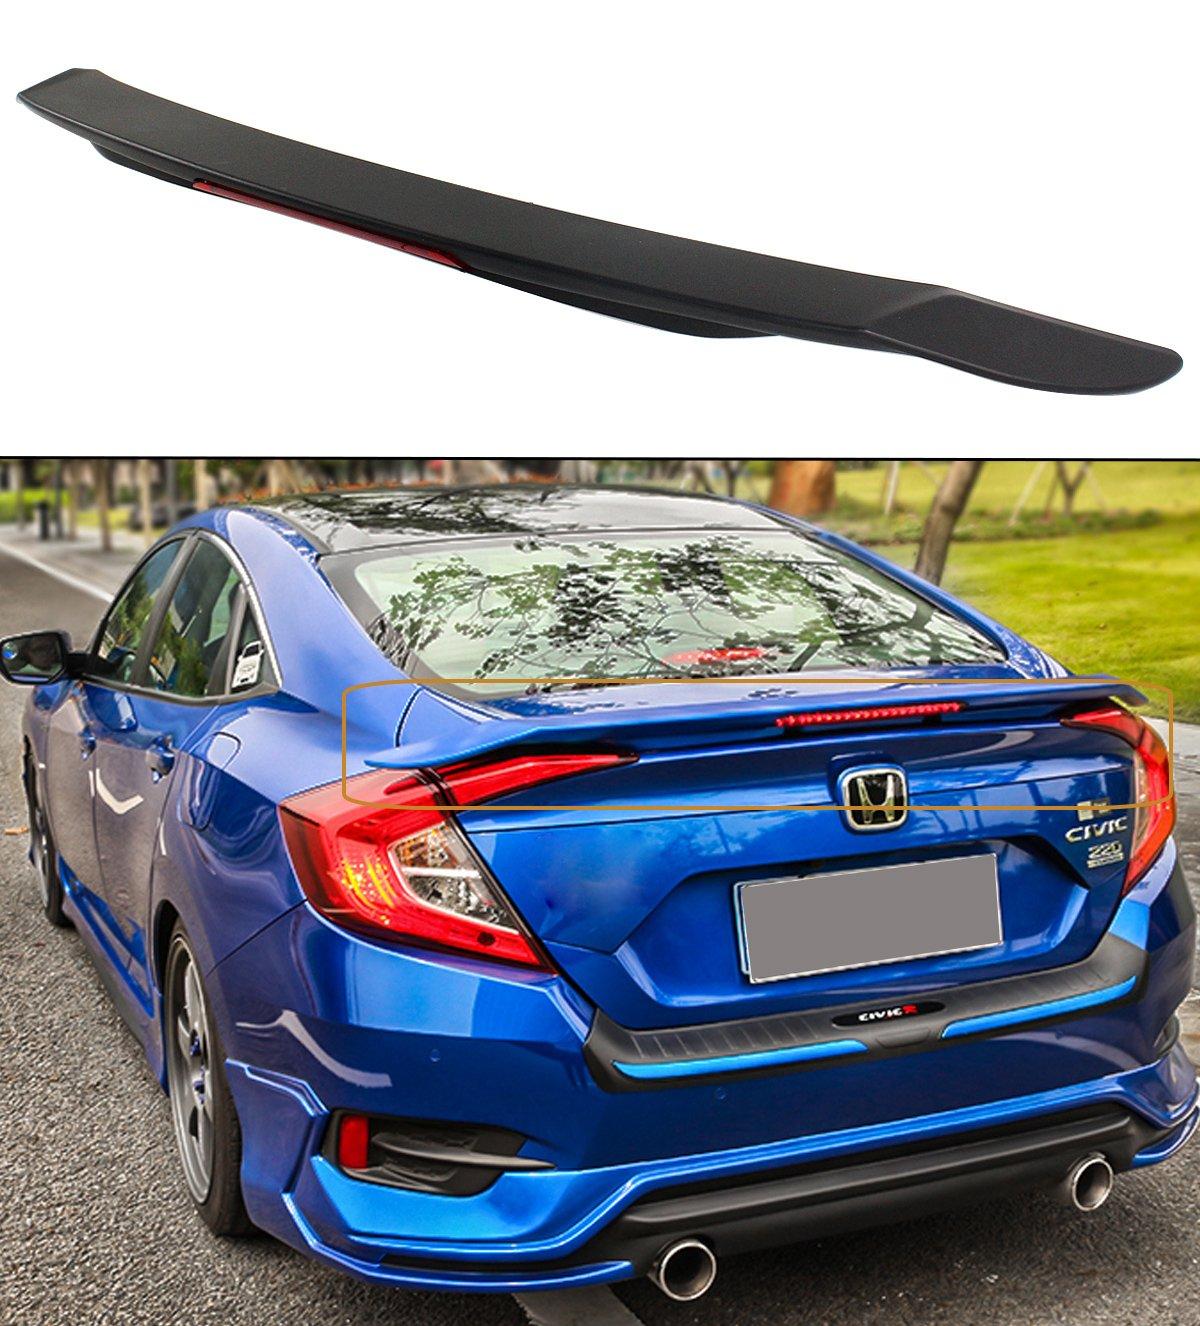 D Style Rear Roof Spoiler Wing Unpainted For Honda Civic 10th Sedan 2016~2018